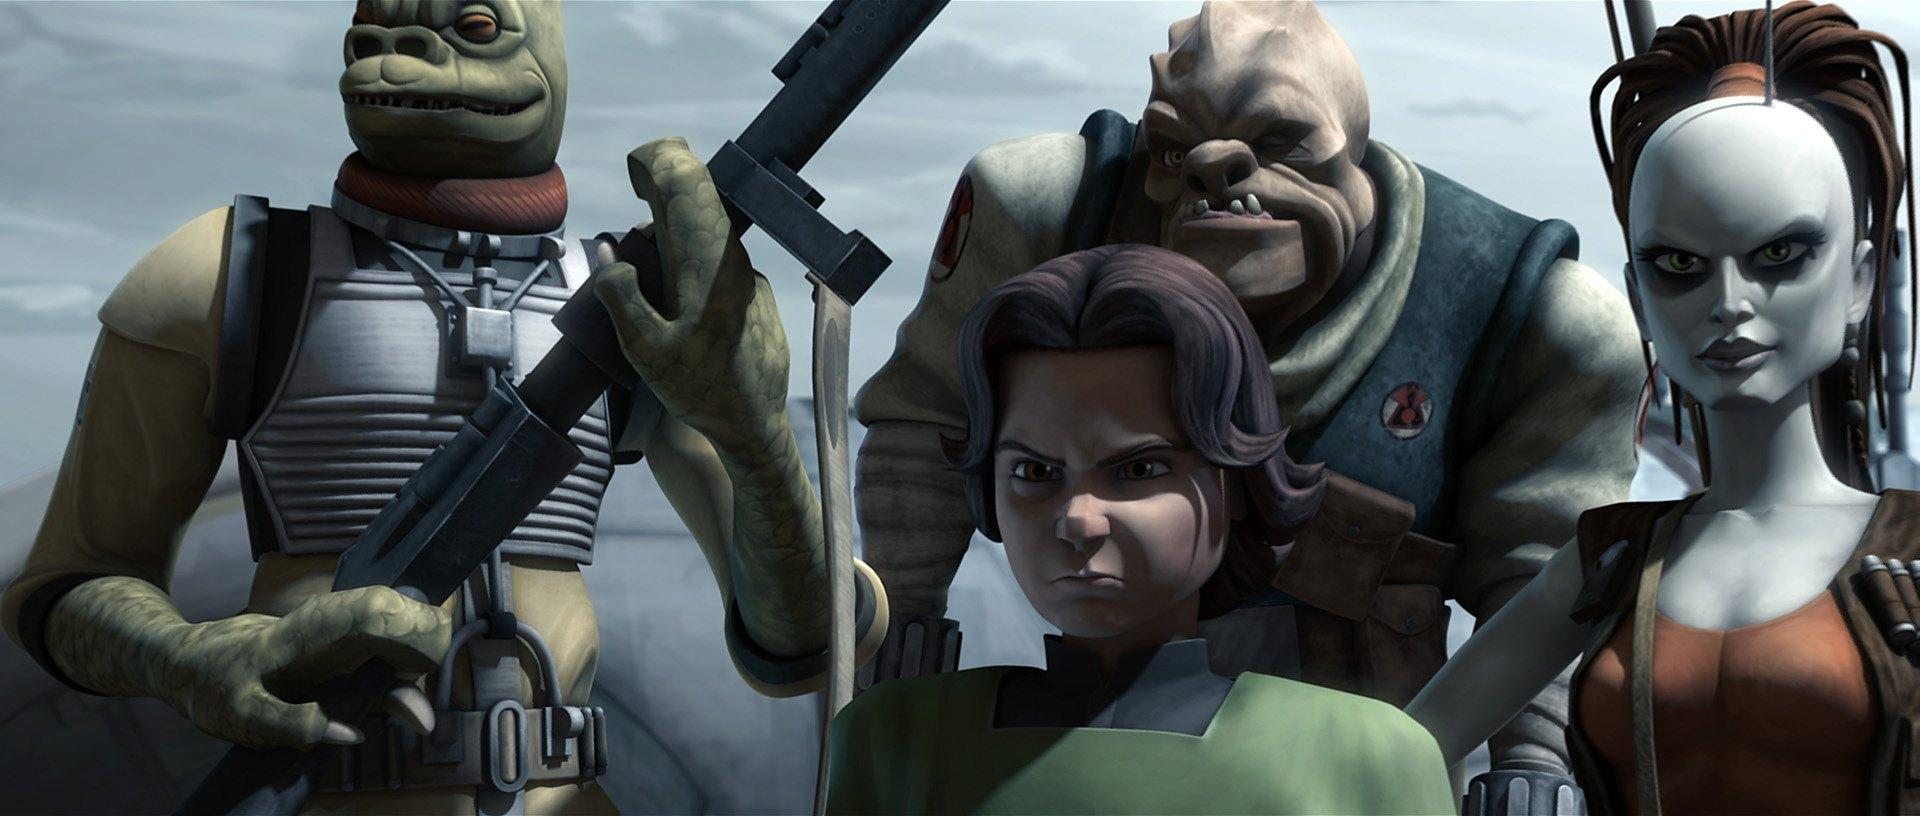 Boba Fett on the Clone Wars